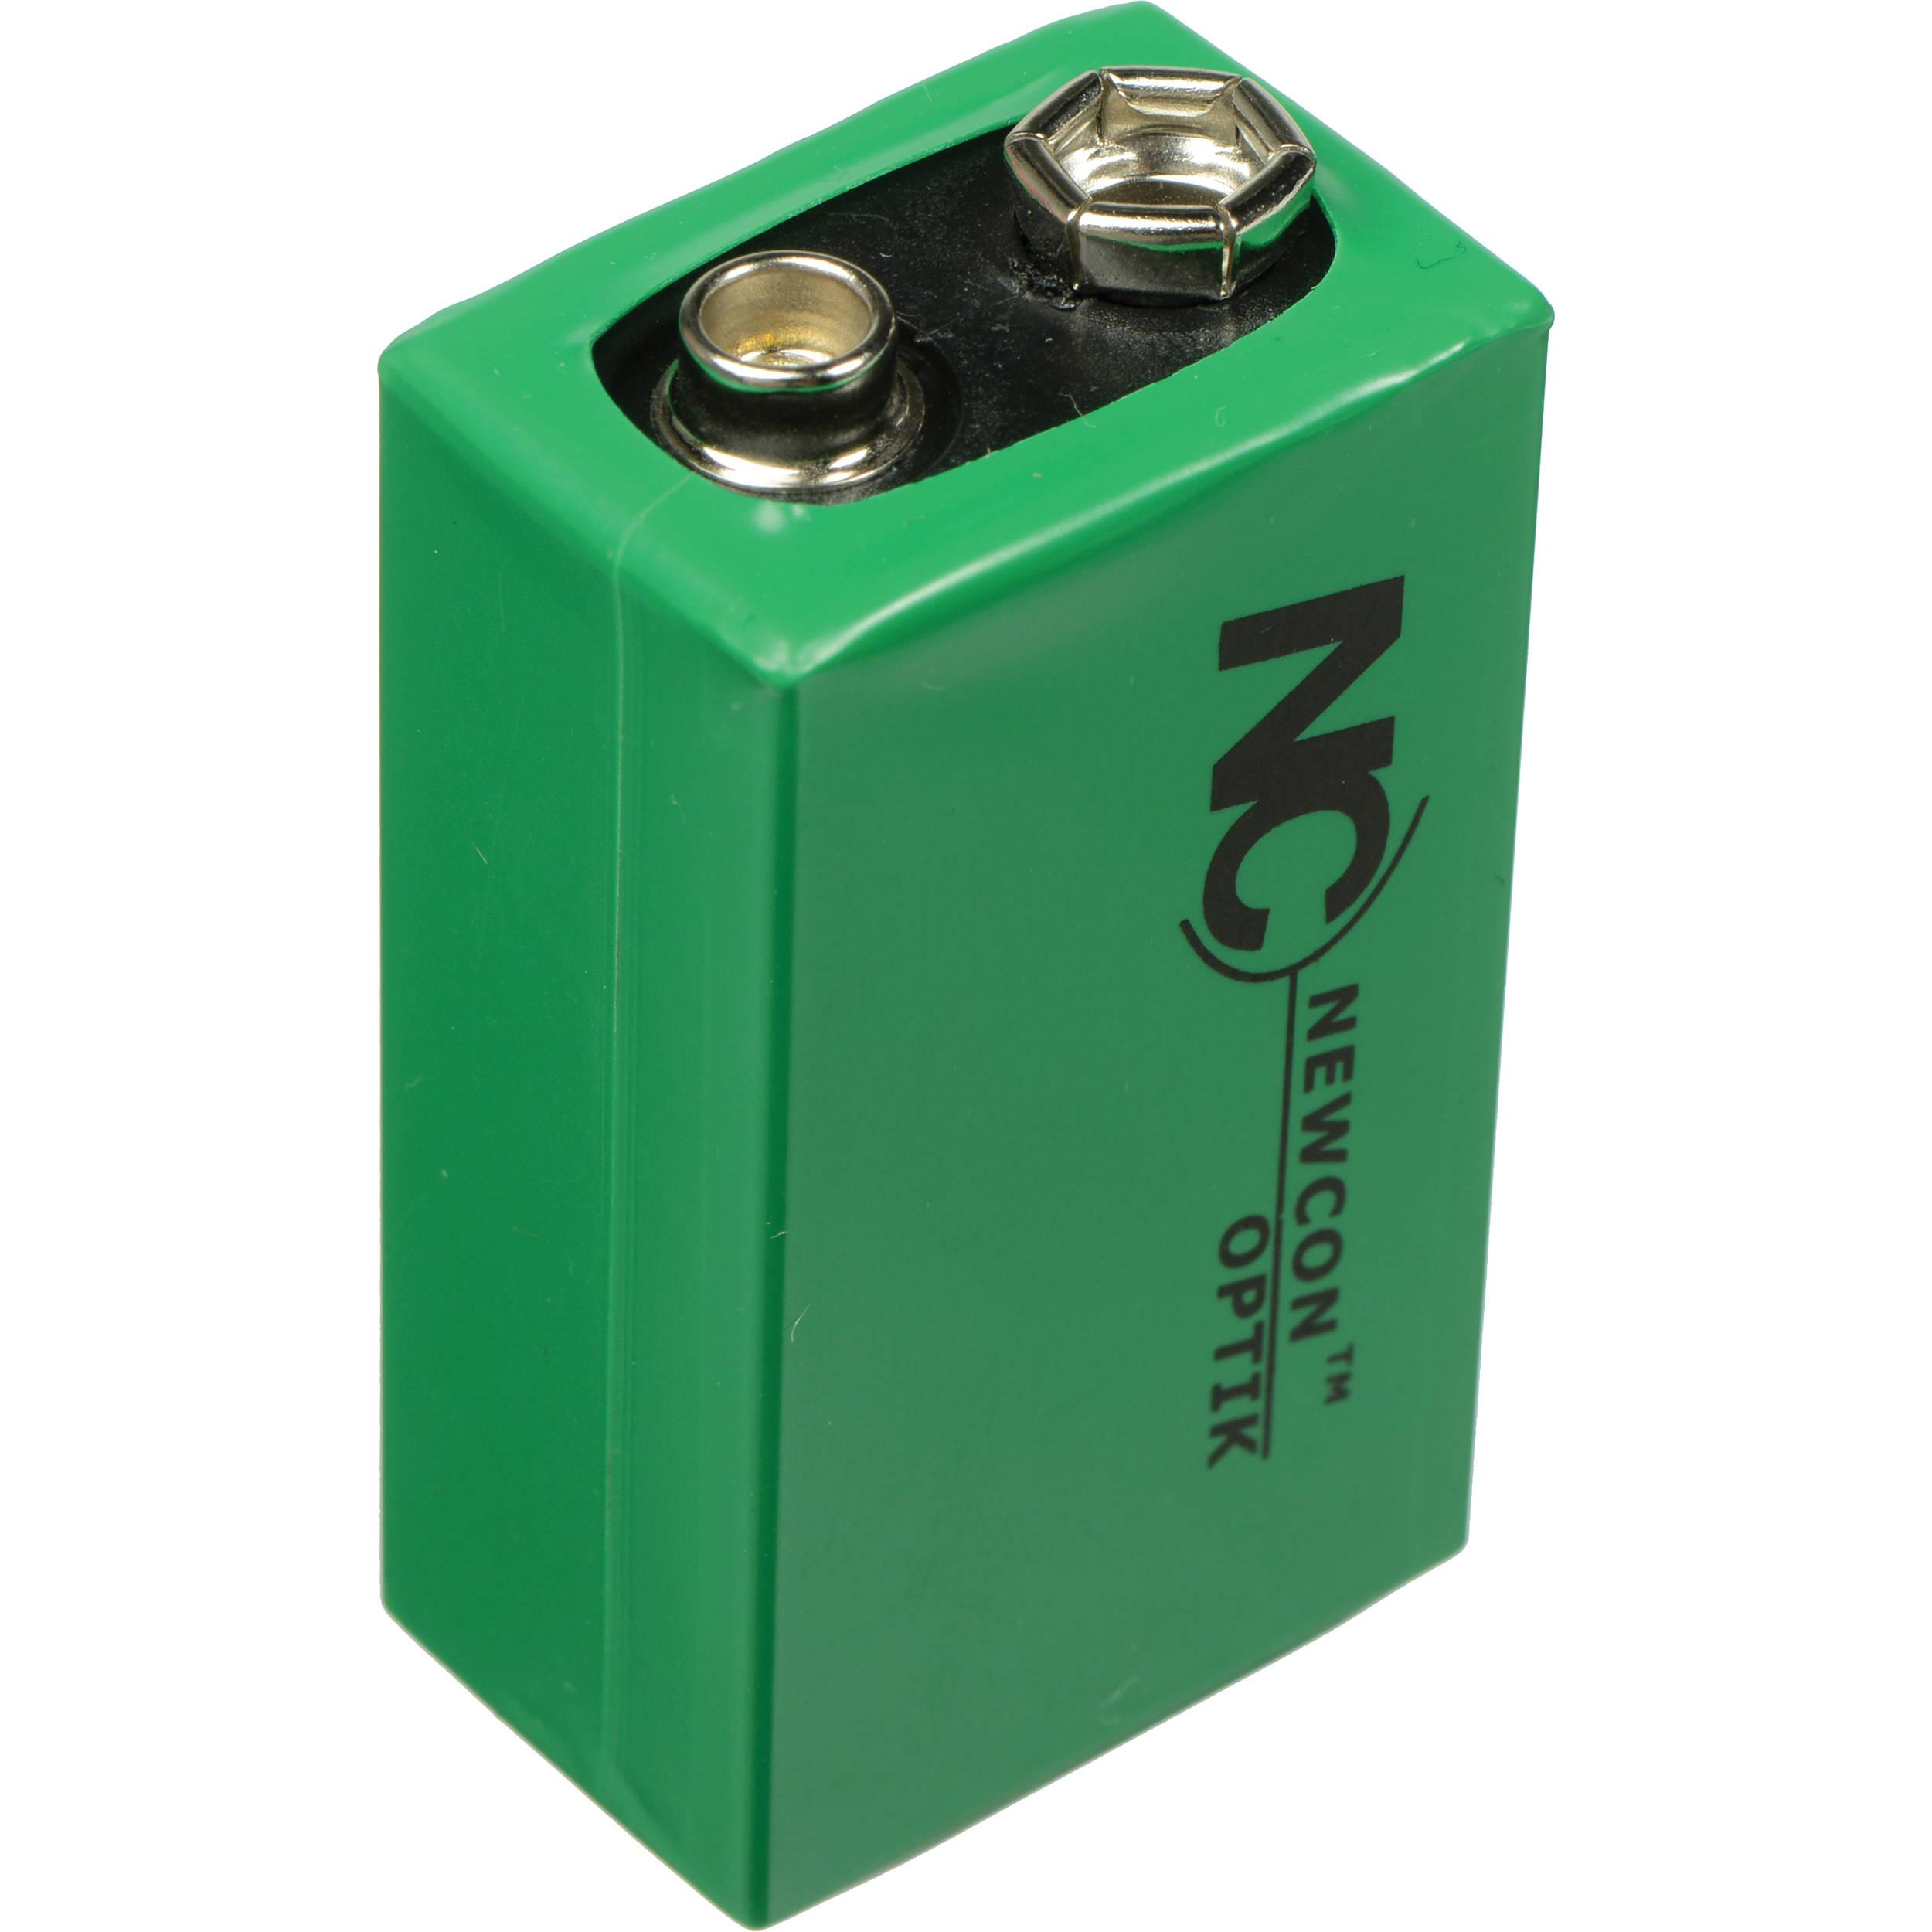 newcon optik lithium non magnetic battery 9v battery 9v b h. Black Bedroom Furniture Sets. Home Design Ideas